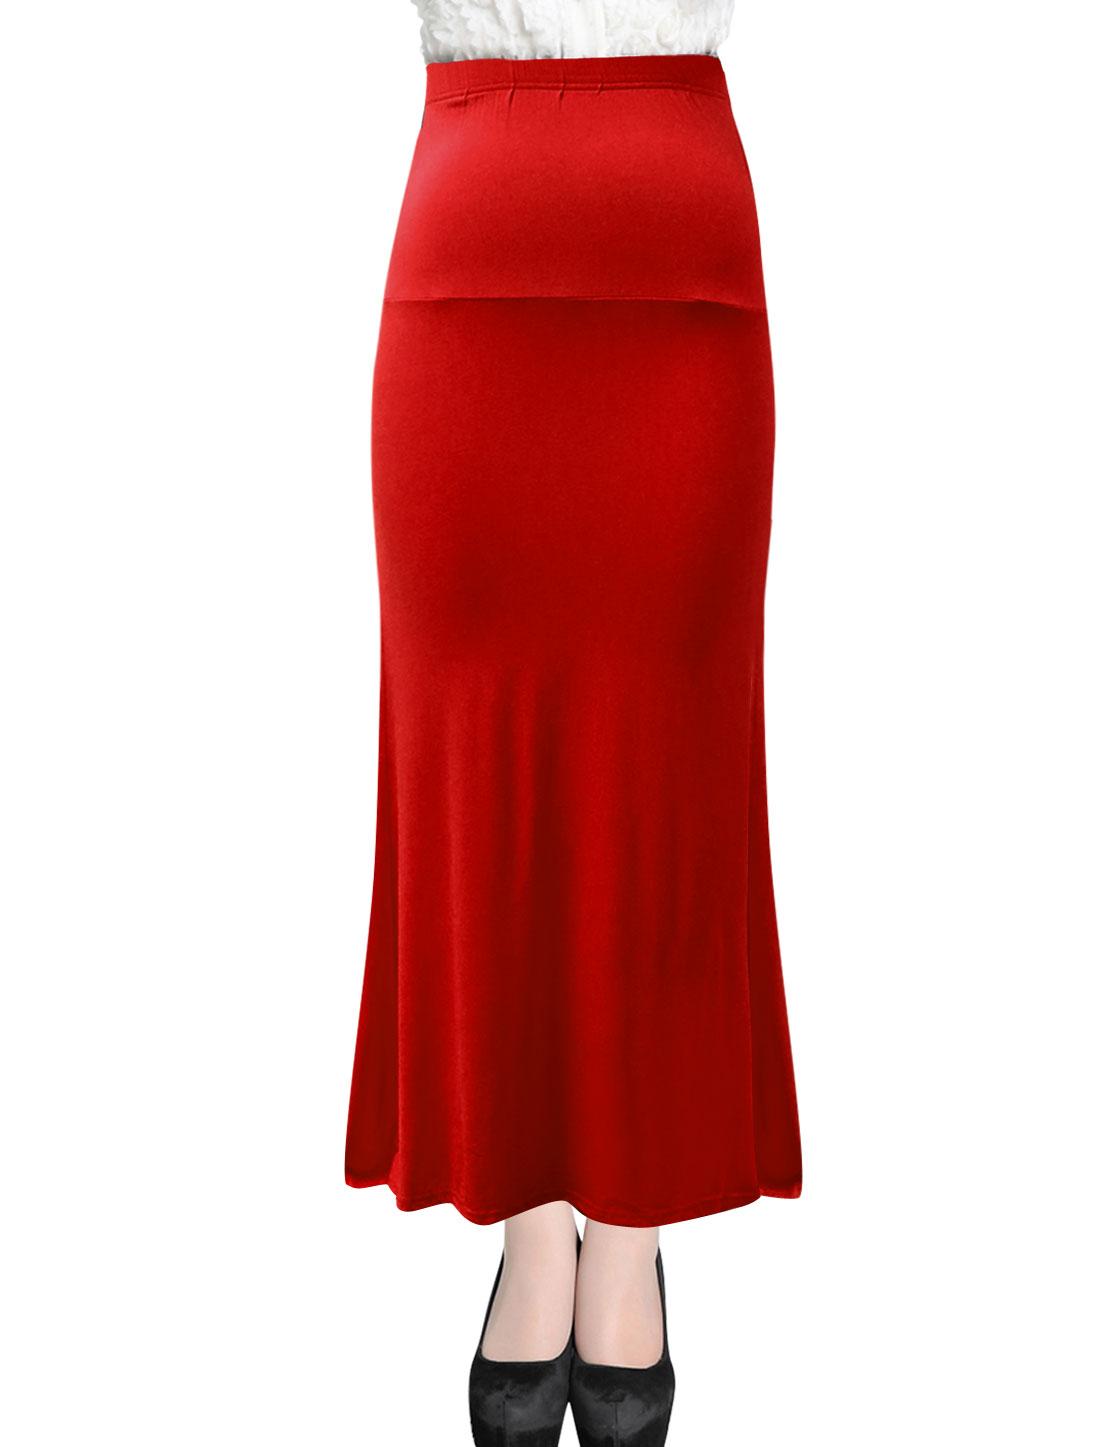 Women Summer Fit Elastic Waist Casual Maxi Straight Skirt Red XL